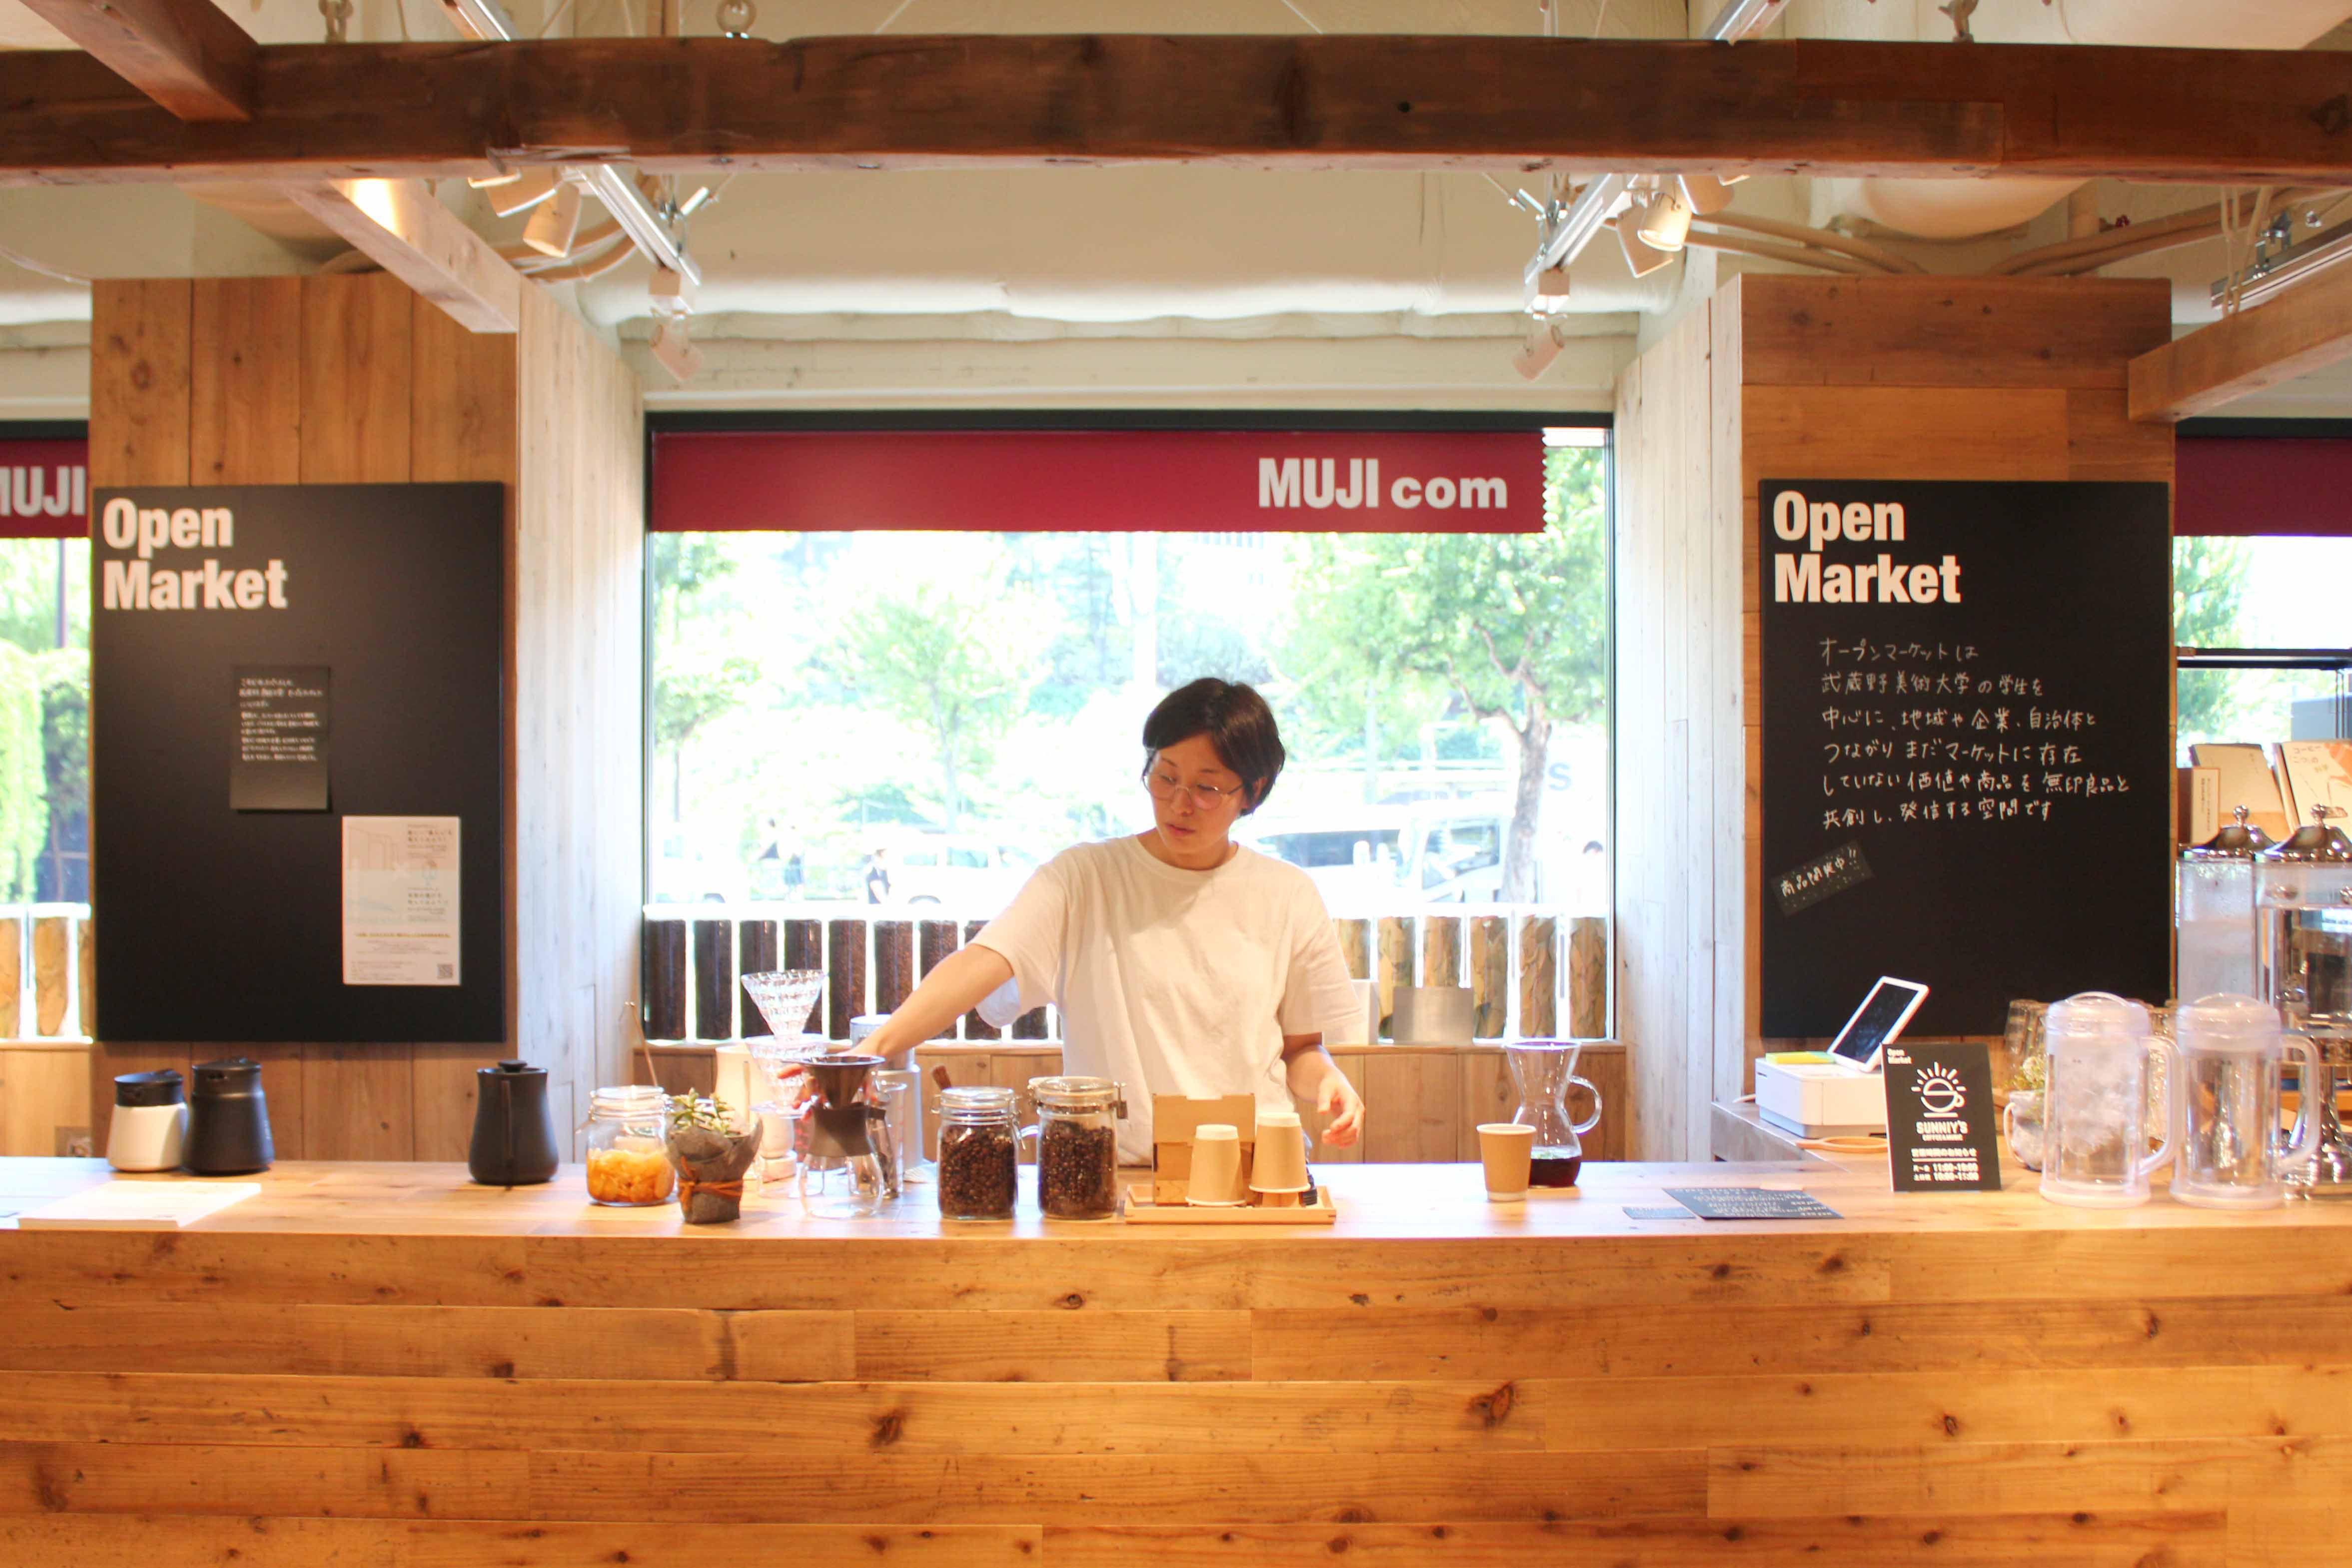 MUJI com 武蔵野美術大学市ヶ谷キャンパス Open Market